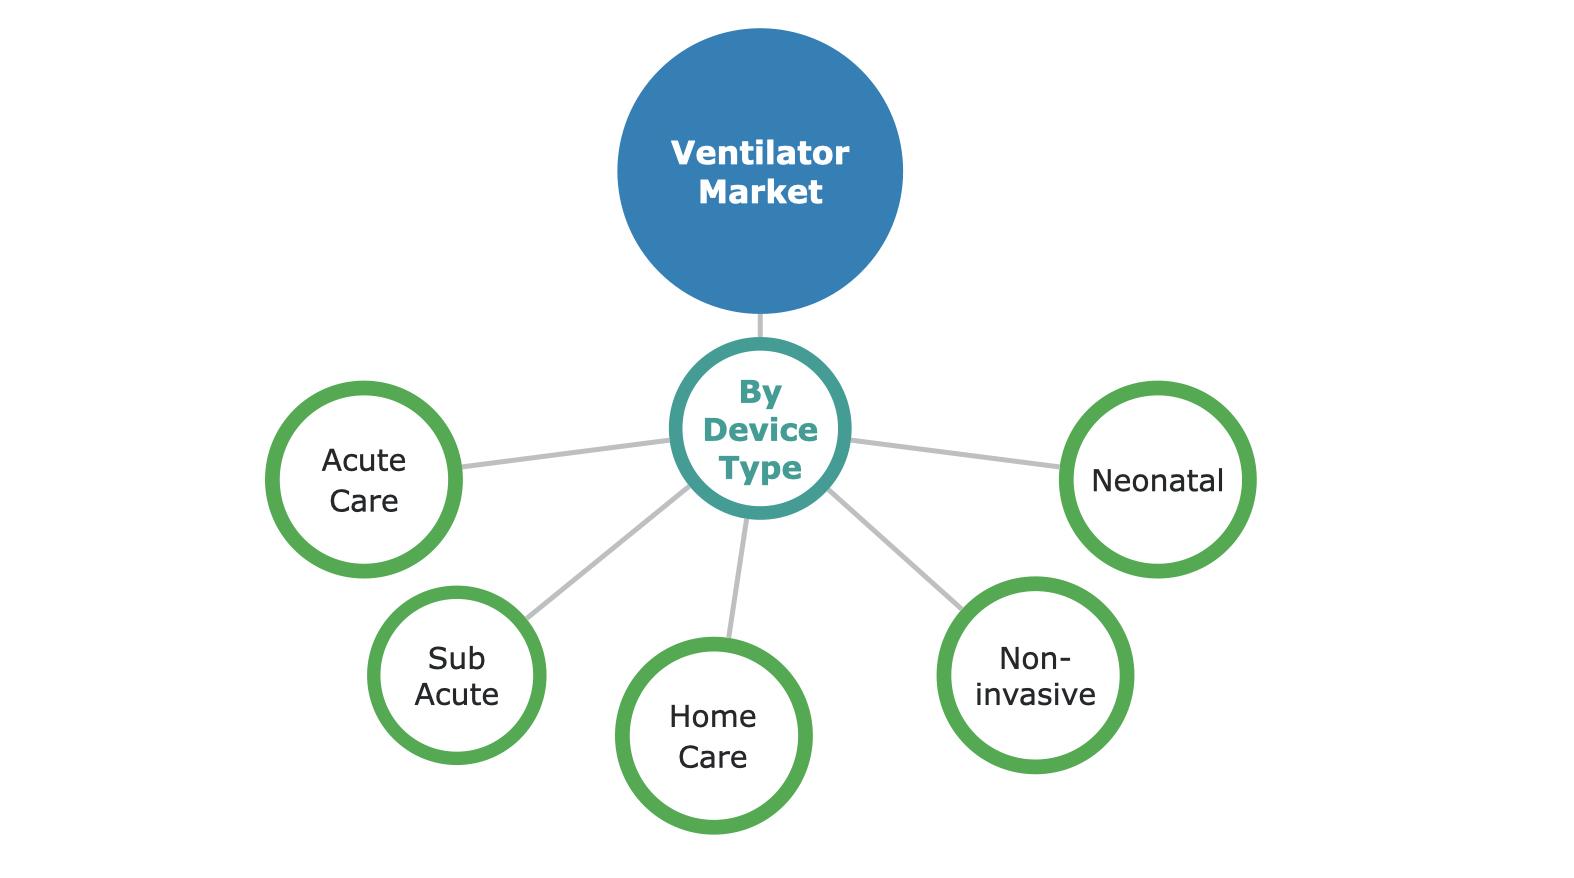 Ventilators Market Segmentation